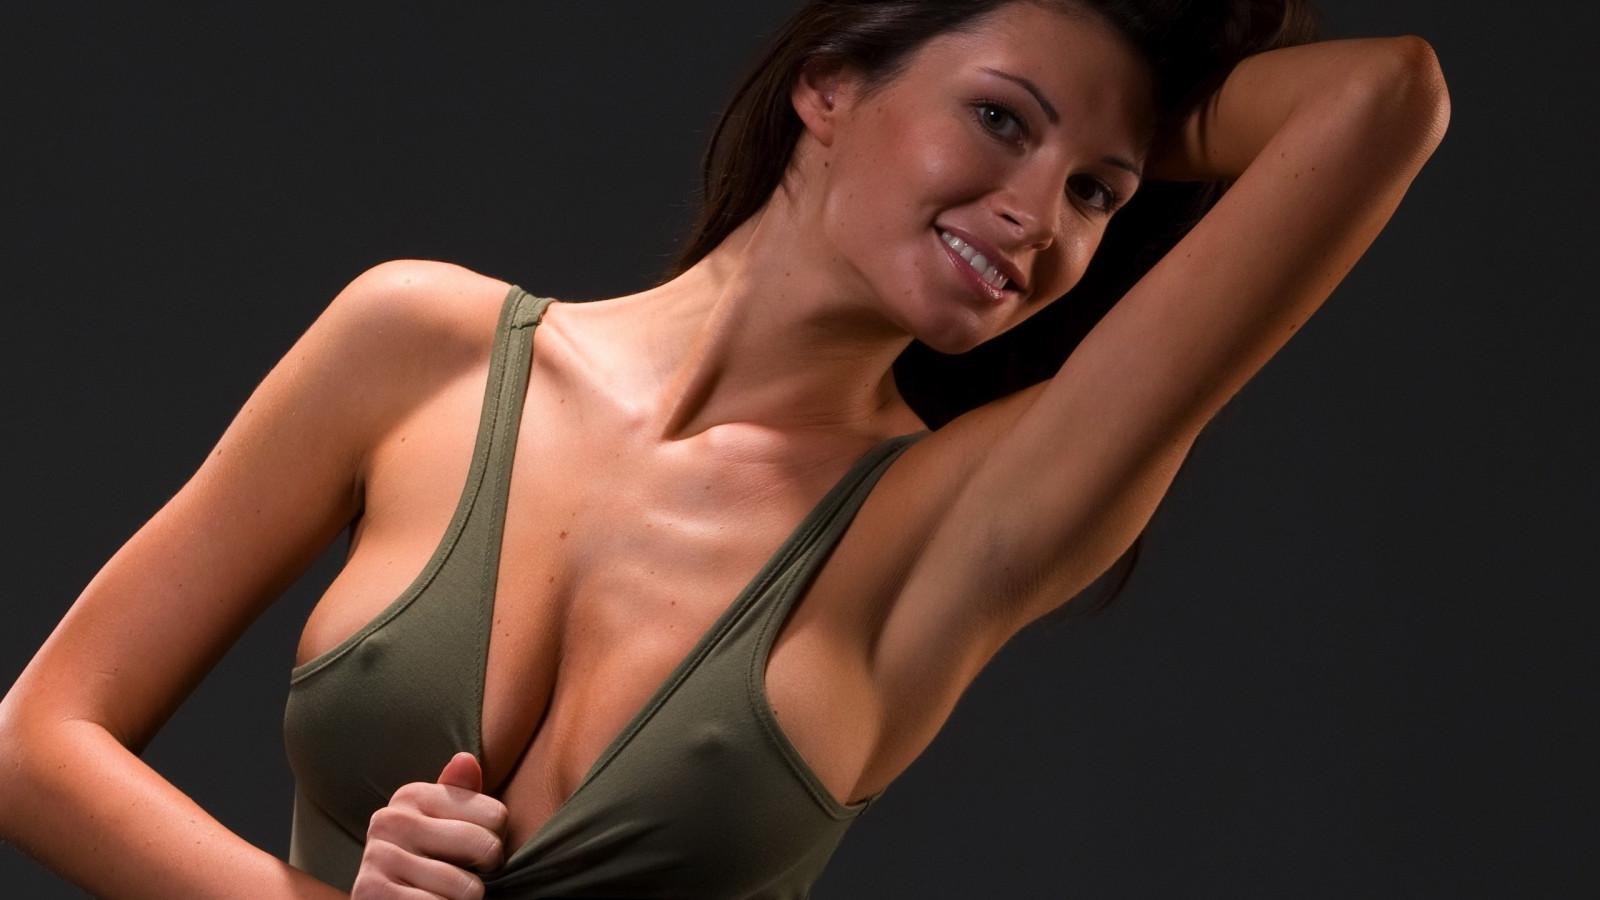 Naked gina philips nude